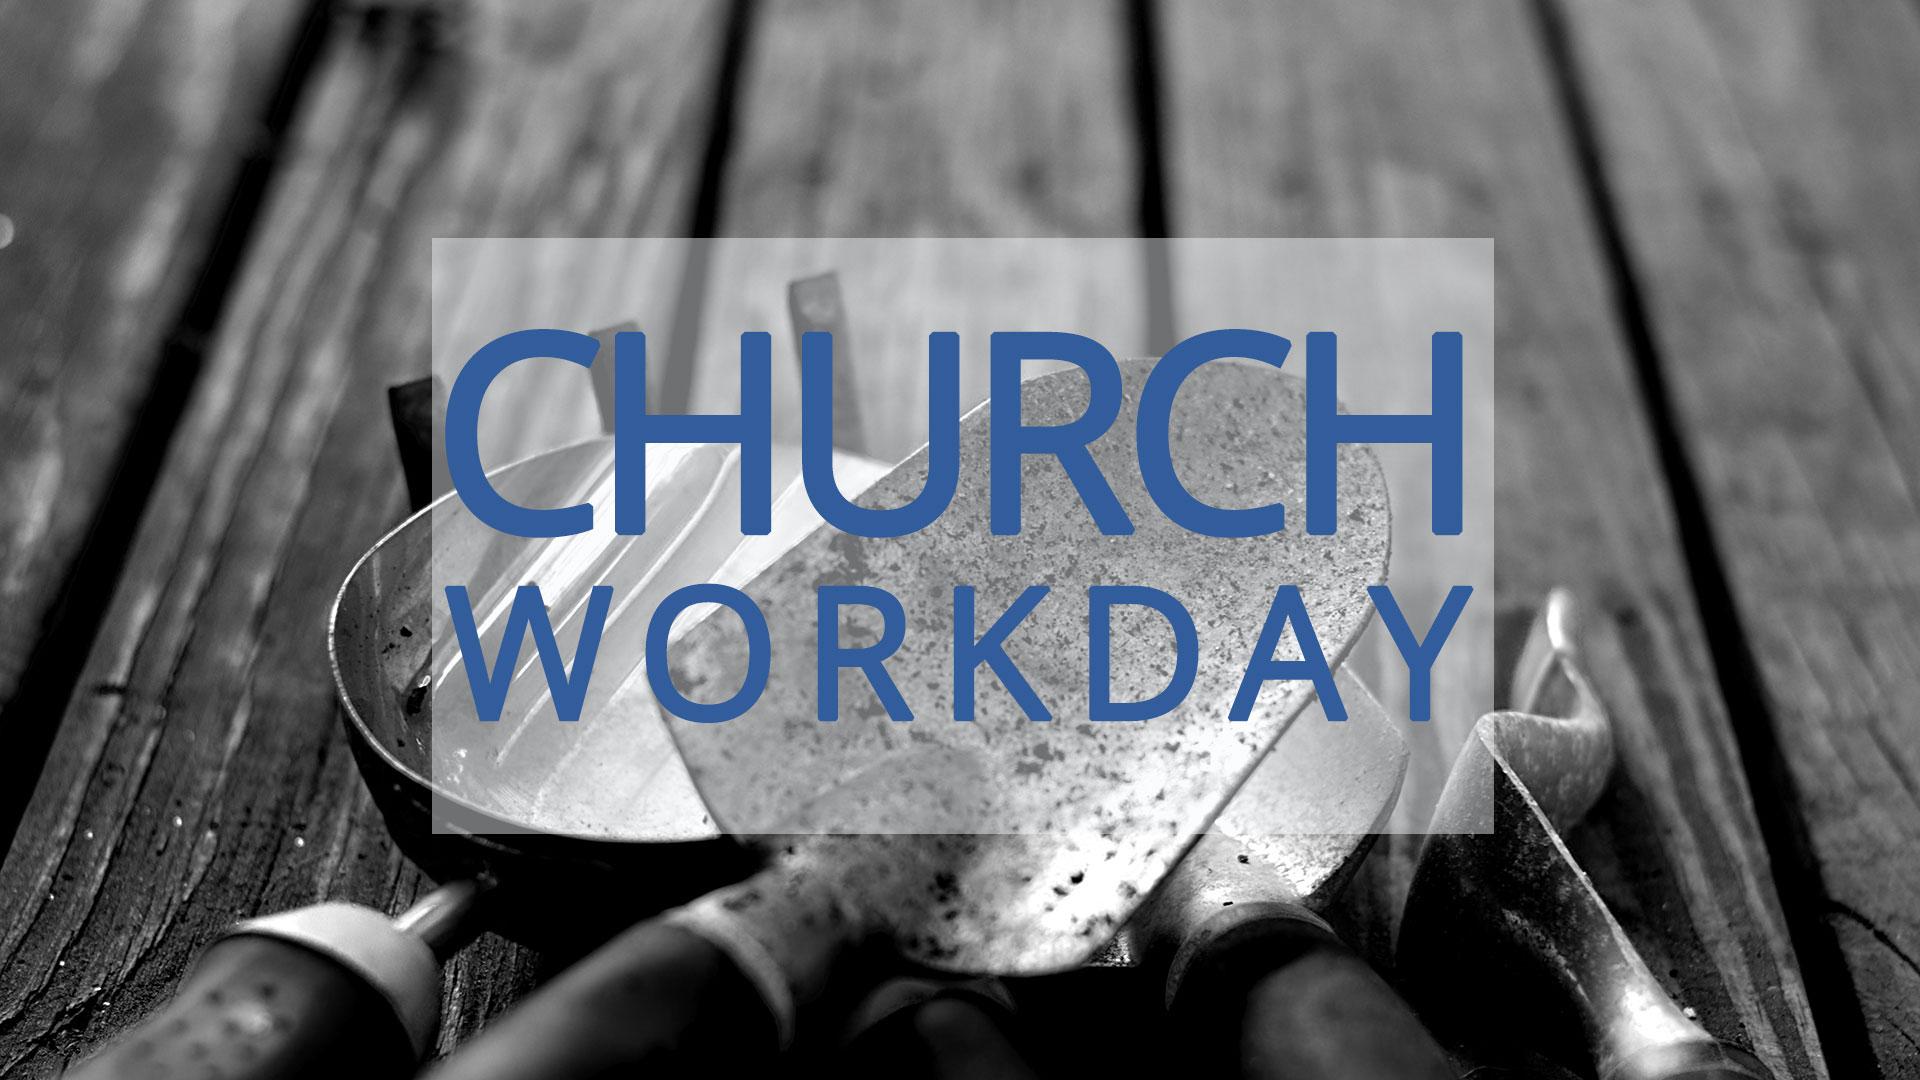 Church Work Day Vessel Orlando